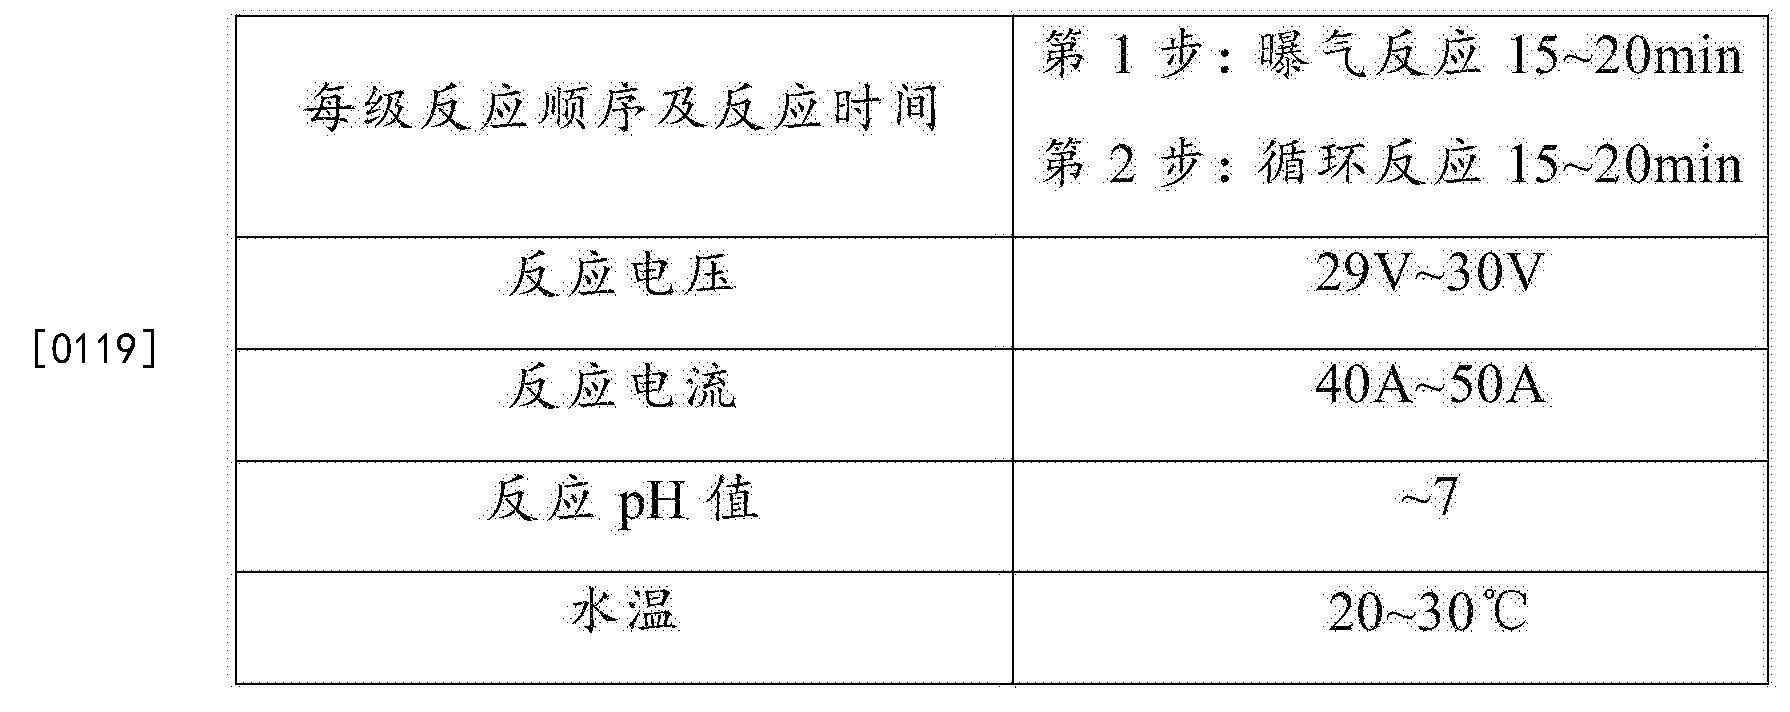 Figure CN205313314UD00131